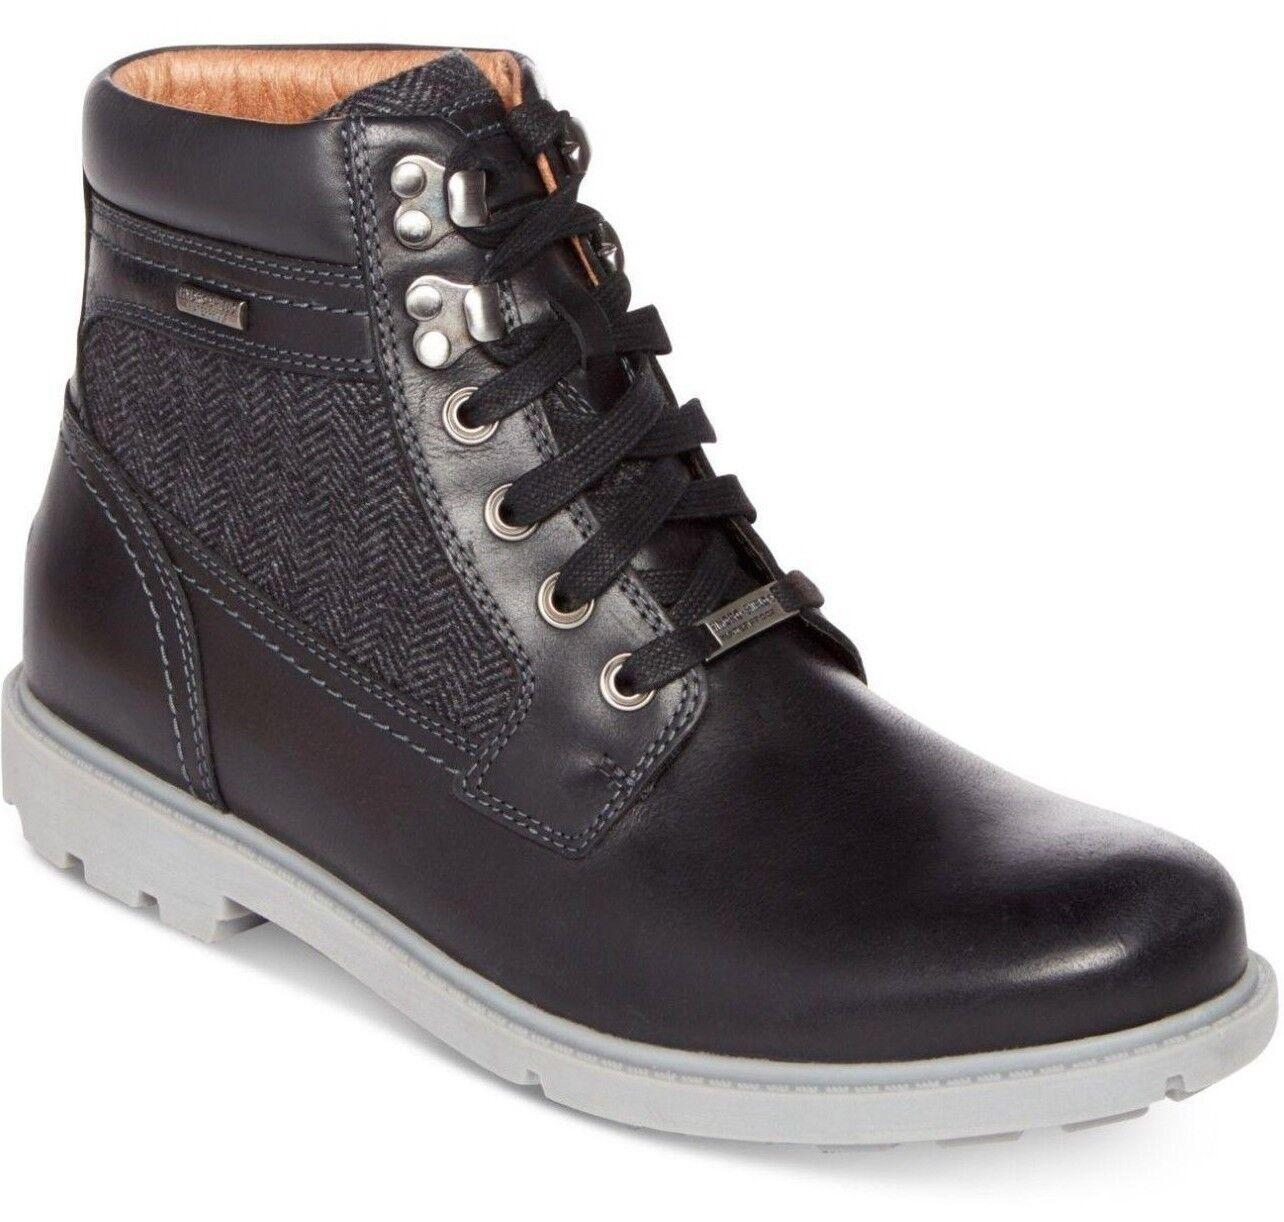 Plain Toe botas Rockport Resistente Buck impermeable Zapatos negro M CH0779